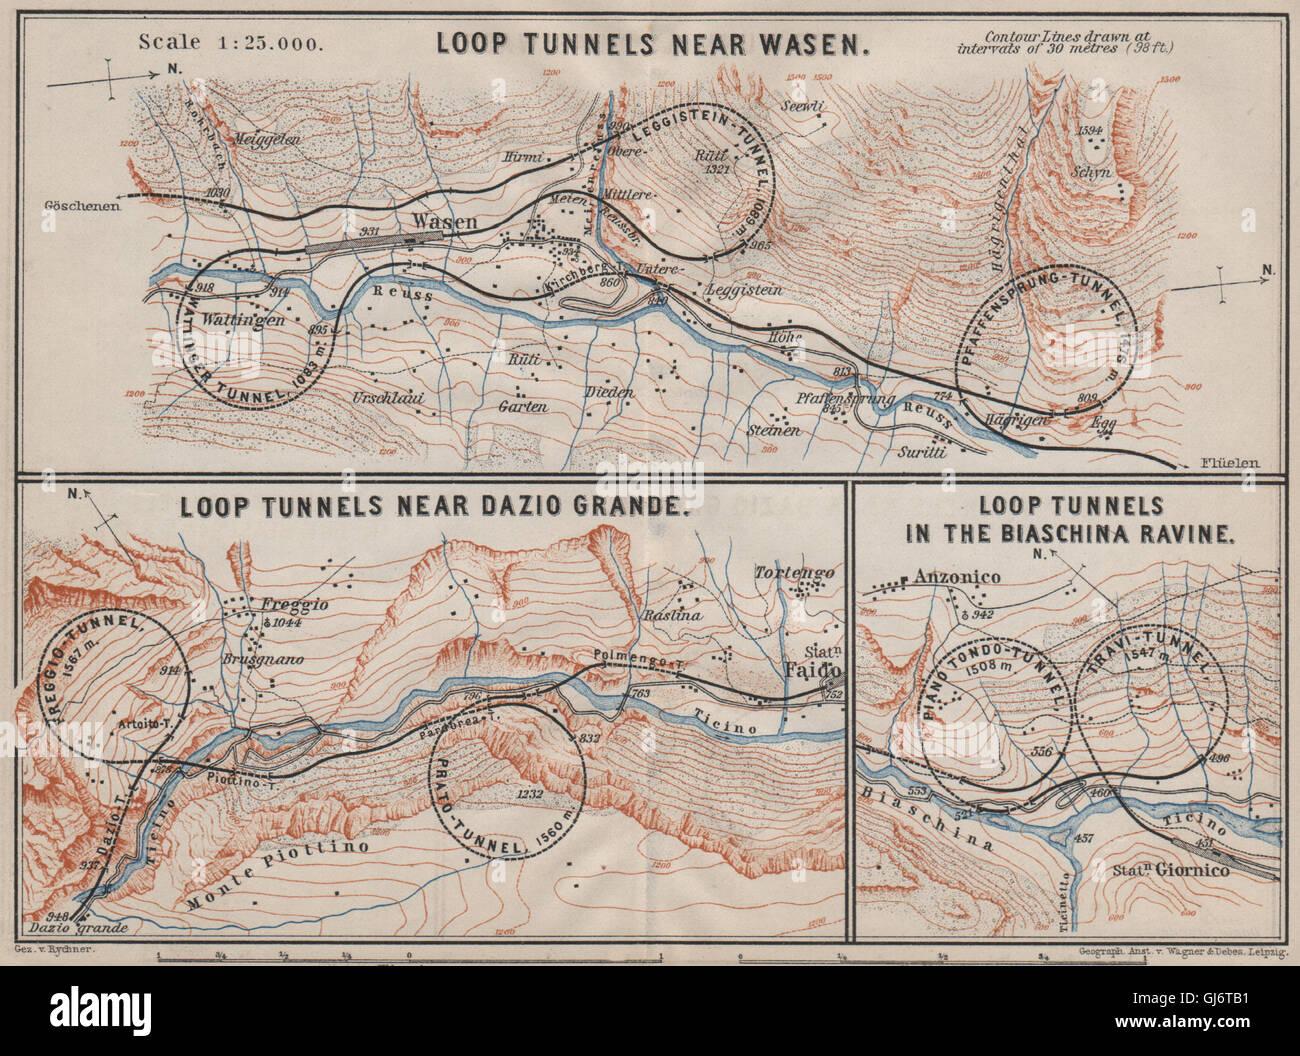 ST GOTTHARD RAILWAY SPIRAL/LOOP TUNNELS Wassen Freggio Prato Biaschina, 1905 map Stock Photo